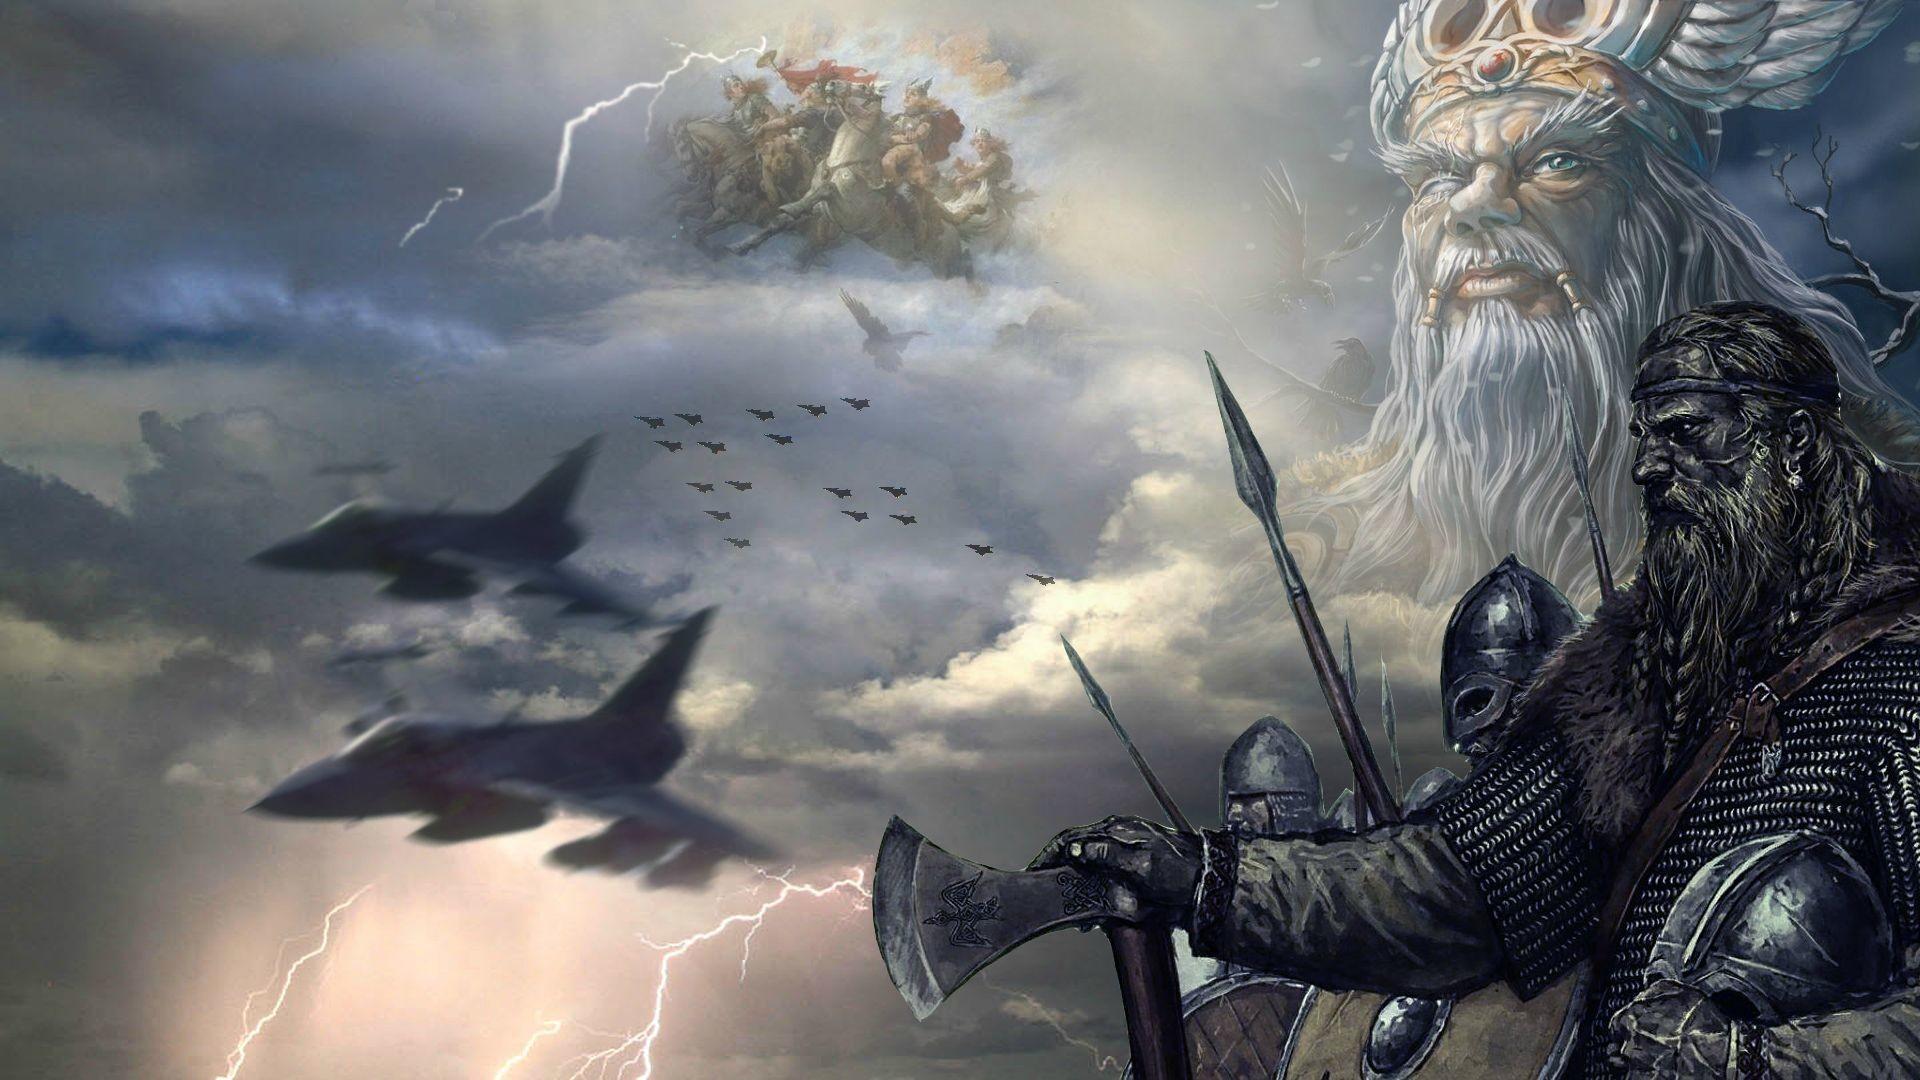 Res: 1920x1080, Vikings HD Wallpaper      ID:45855